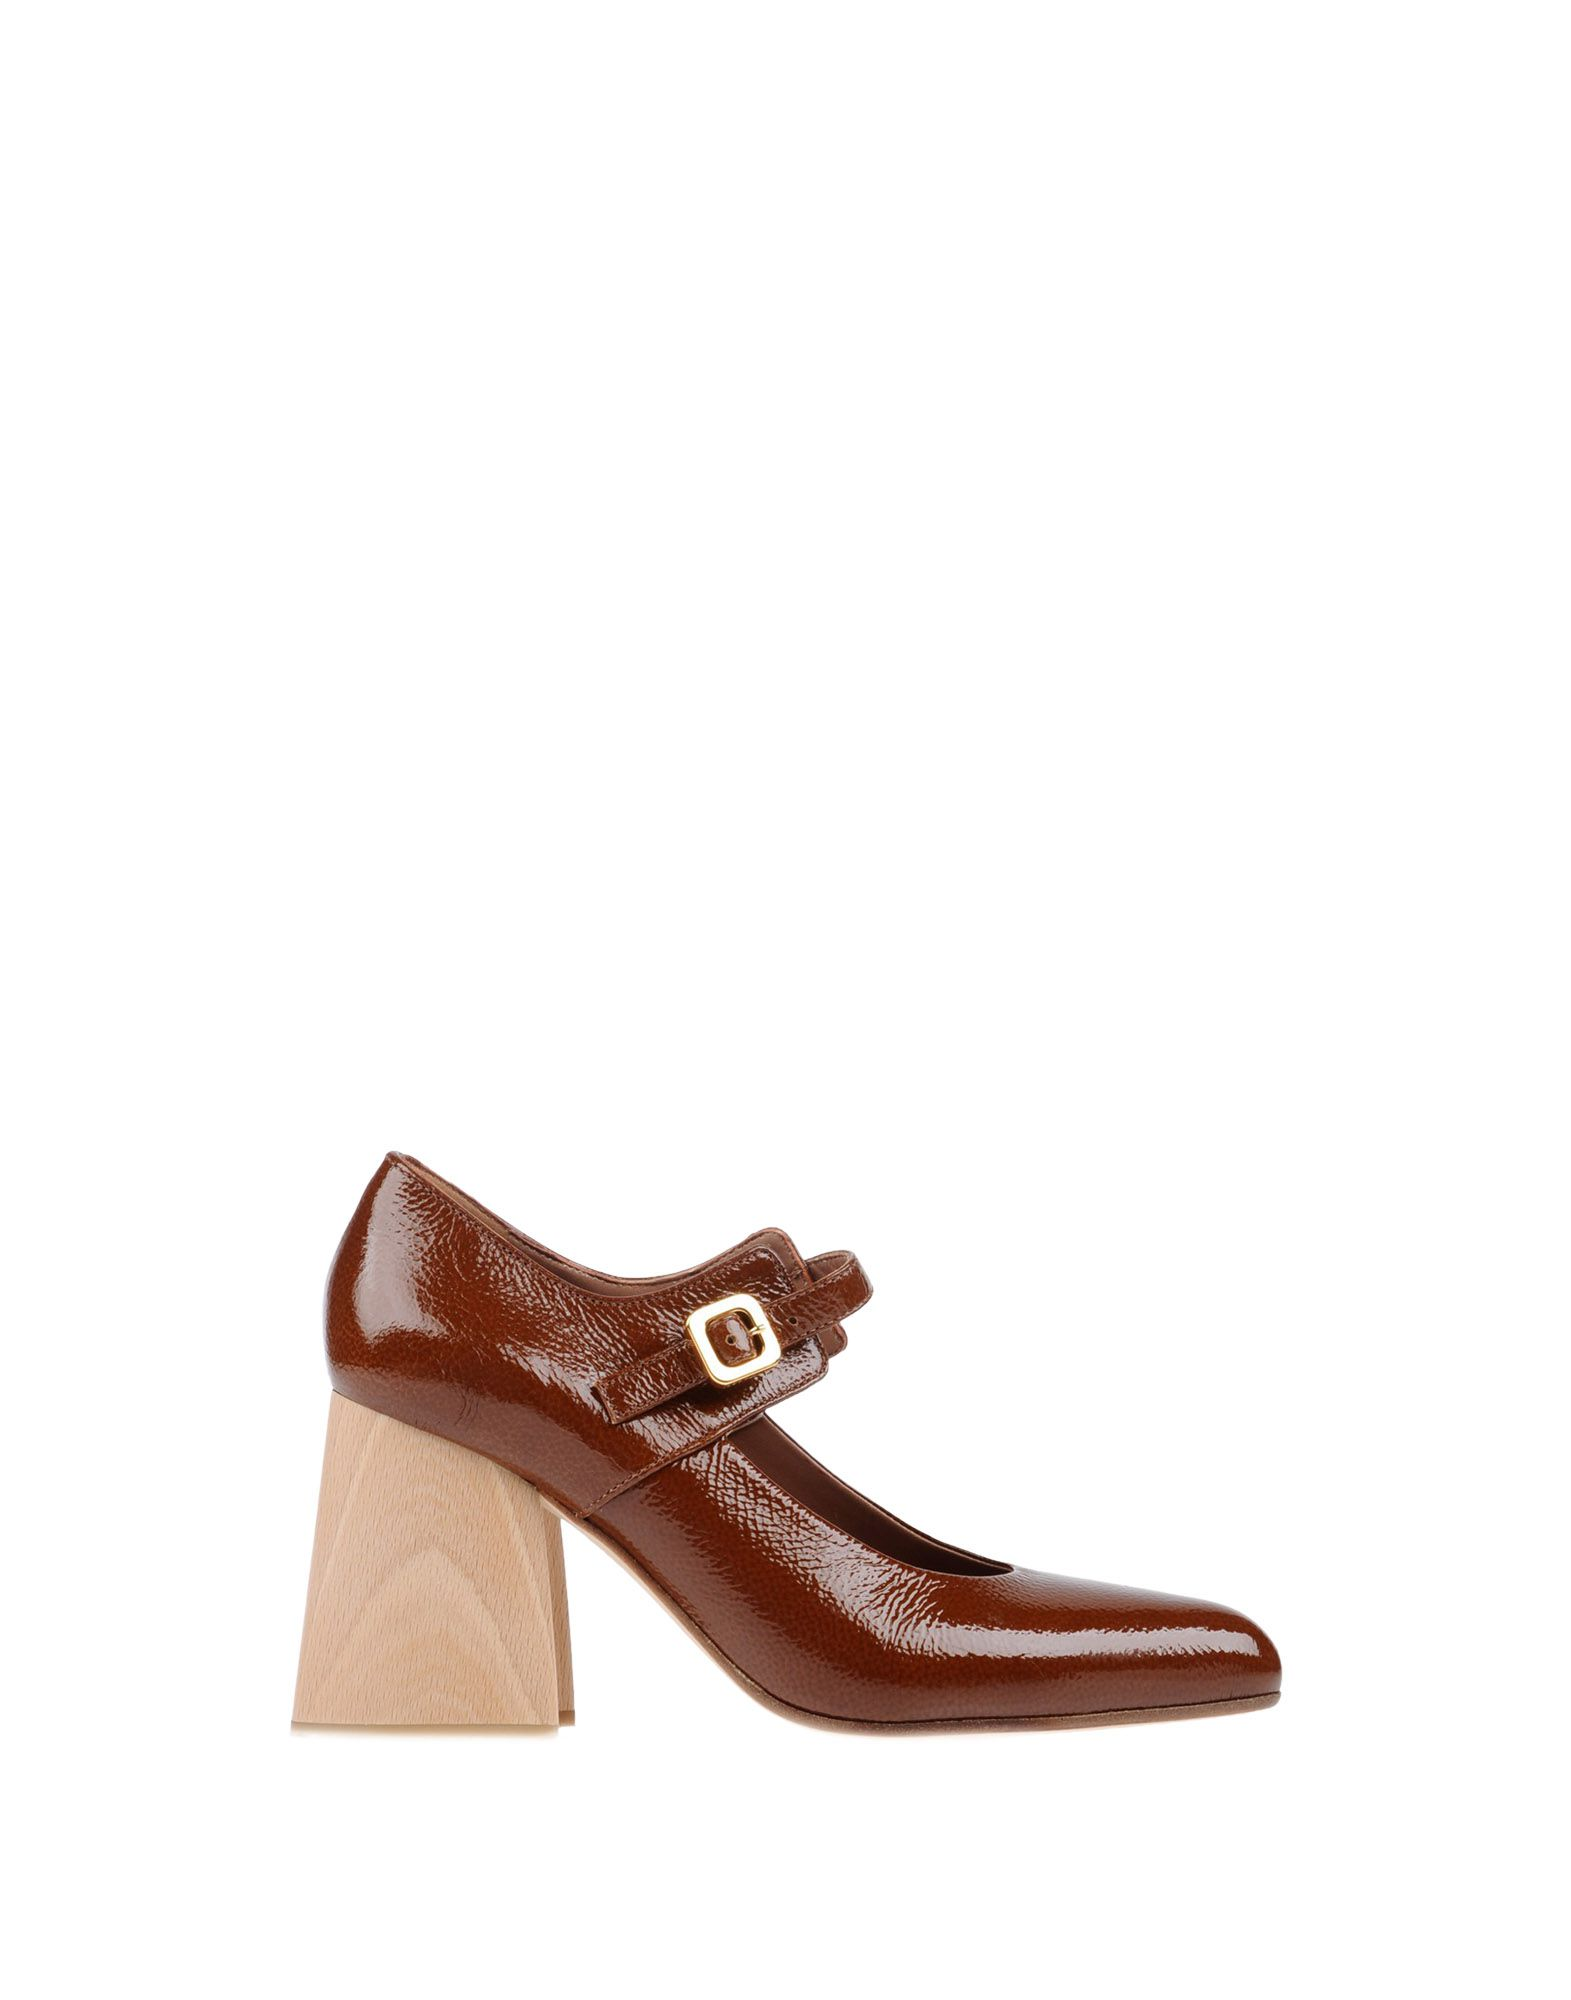 Marni Pumps Damen  11257342RDGut Schuhe aussehende strapazierfähige Schuhe 11257342RDGut e86df4